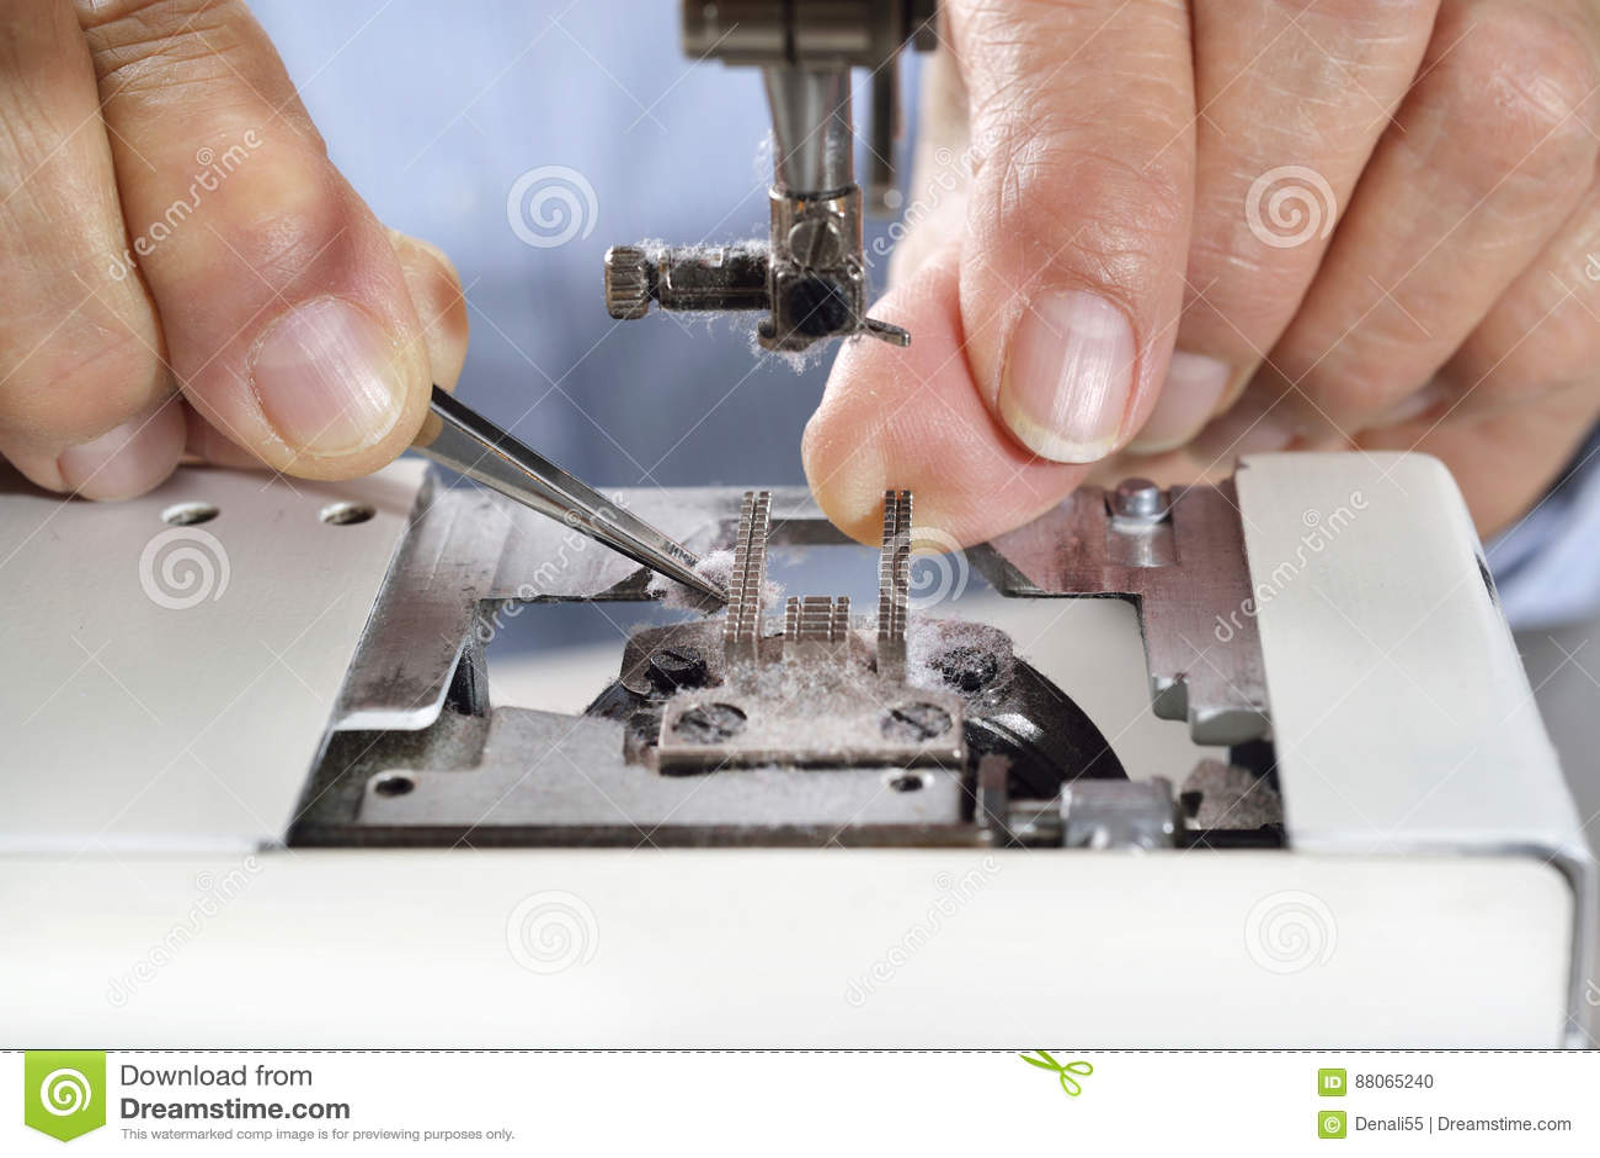 Dressmakers Sewing Tweezers